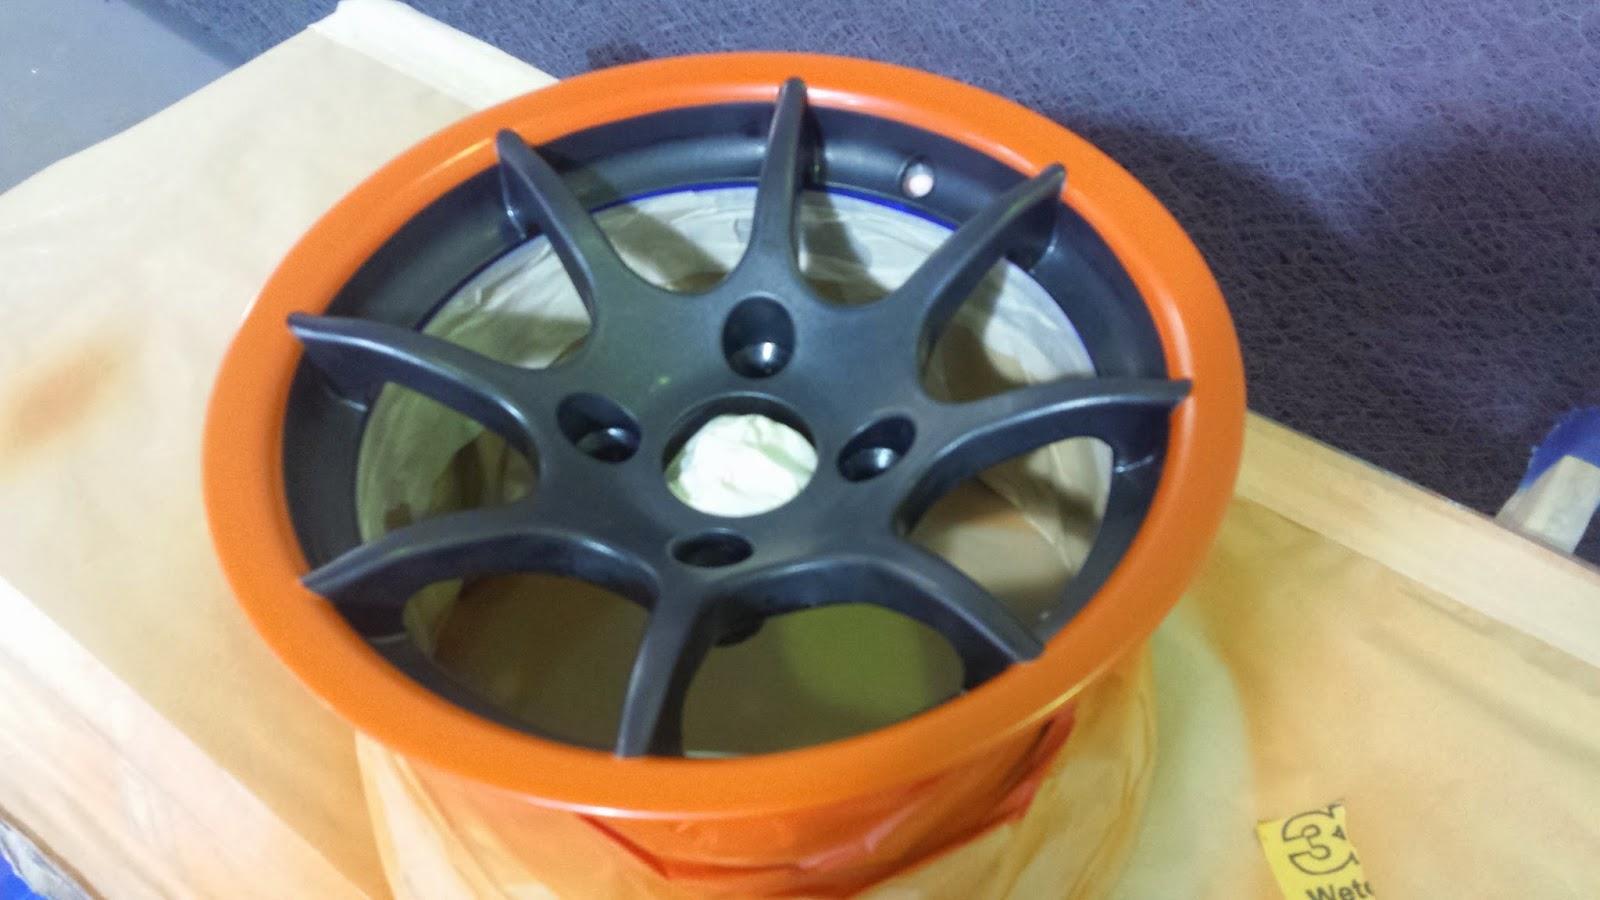 Wheel rim sprayed with RAL 2004